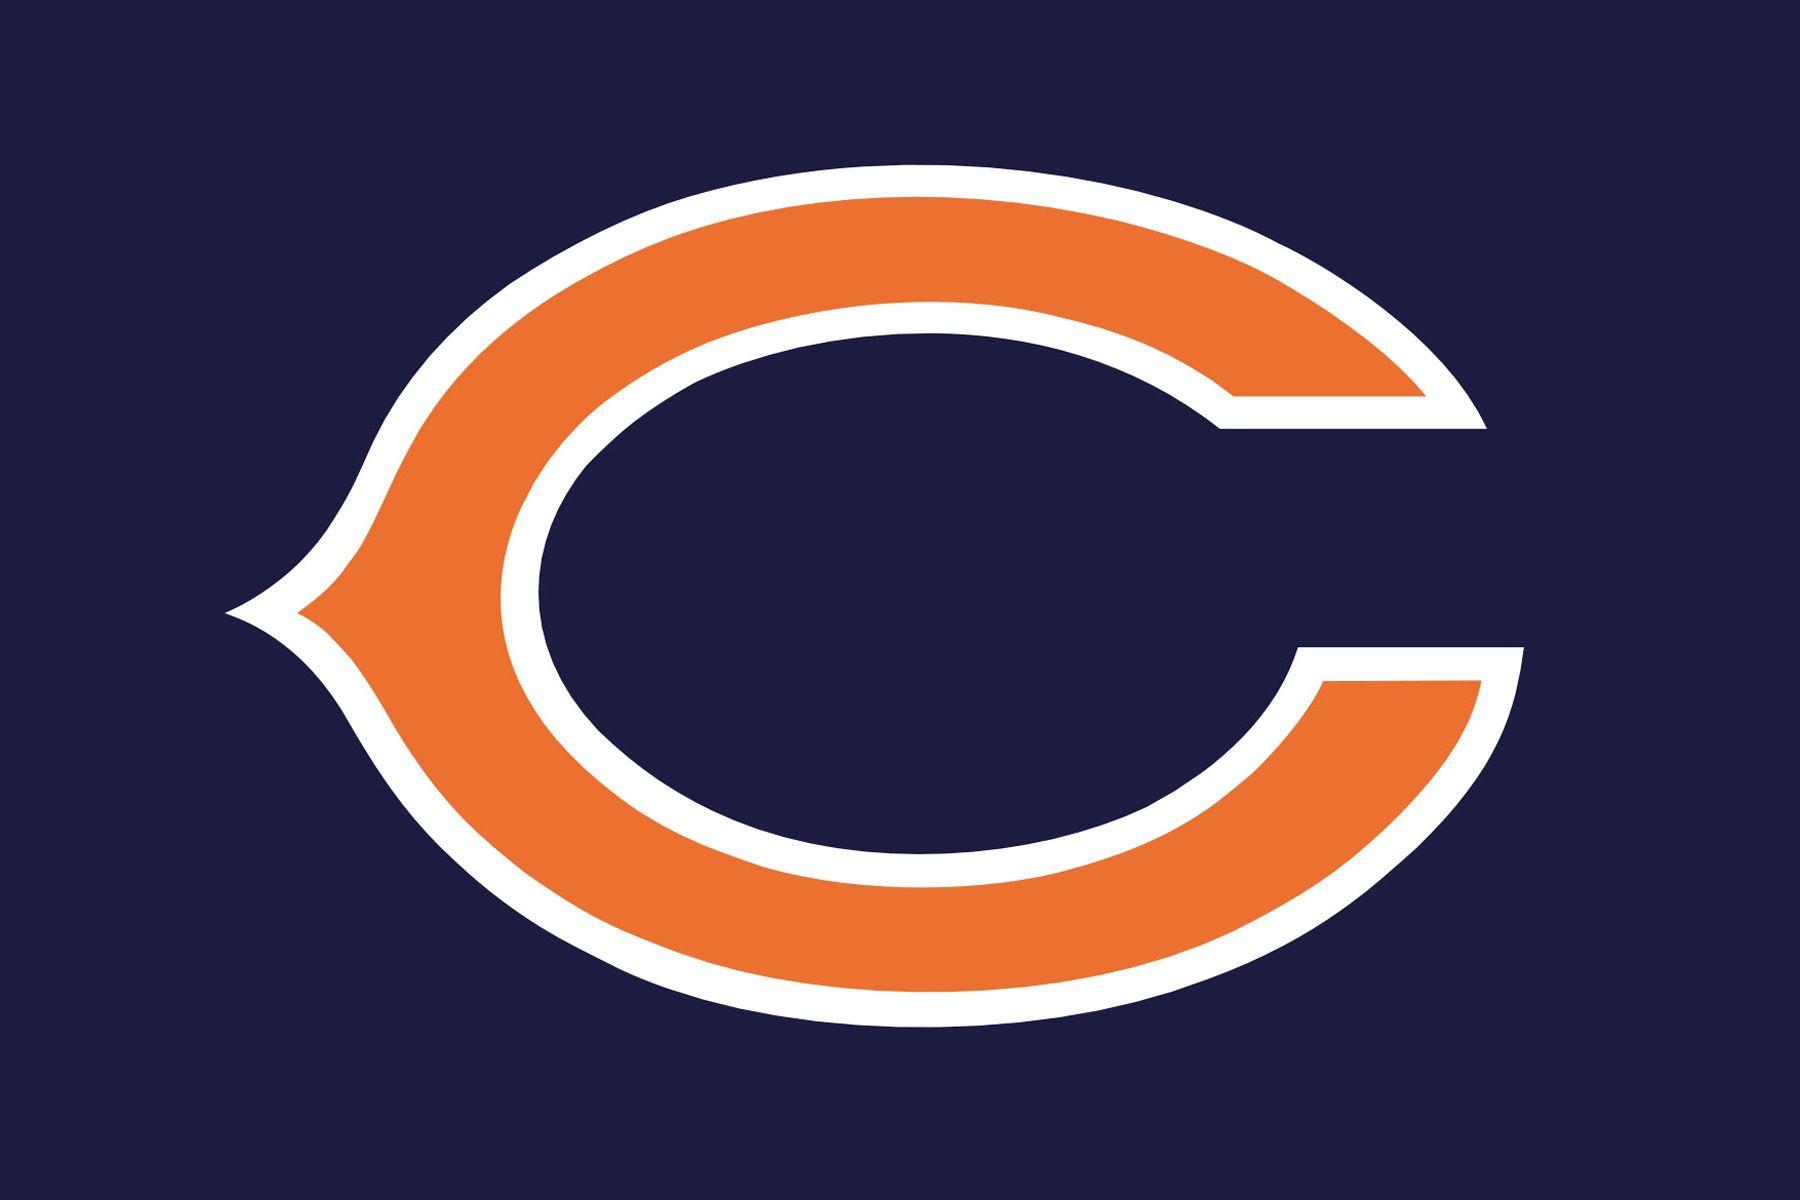 Chicago Bears Logo Clipart Clipart Chicago Bears Logo Nfl Teams Logos Chicago Bears Wallpaper